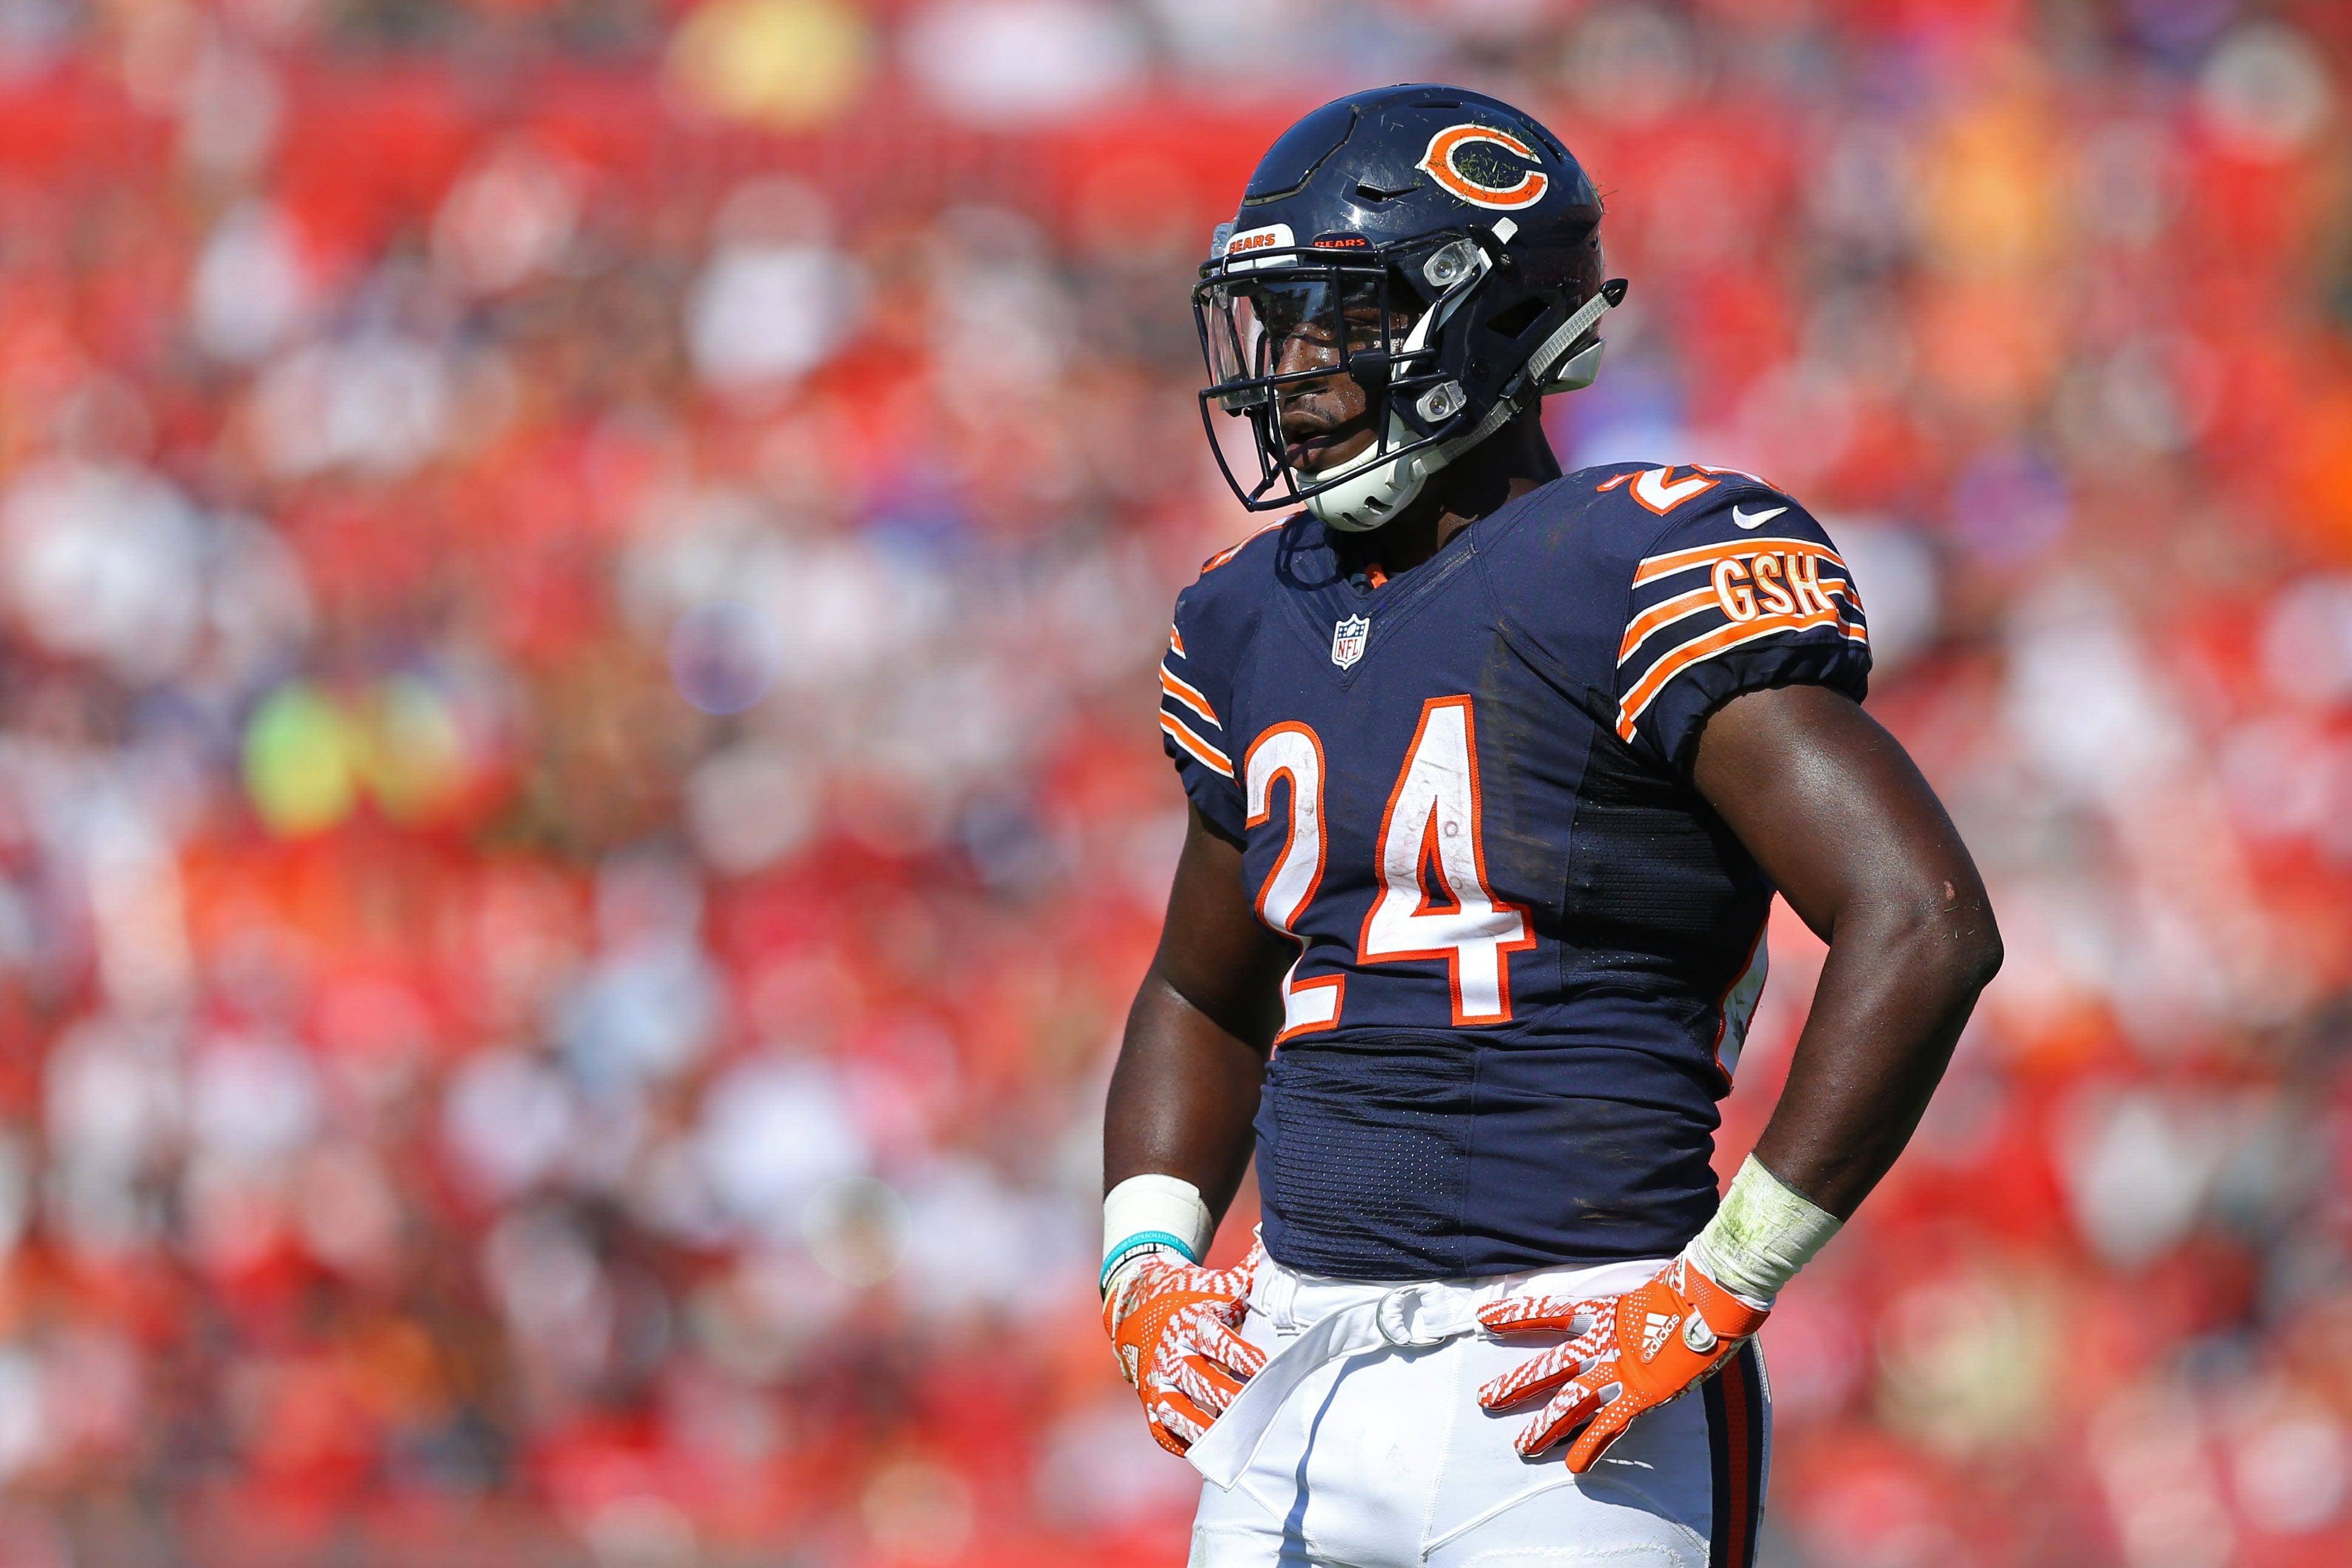 Jordan Howard breaks the Chicago Bears all time rookie rushing record